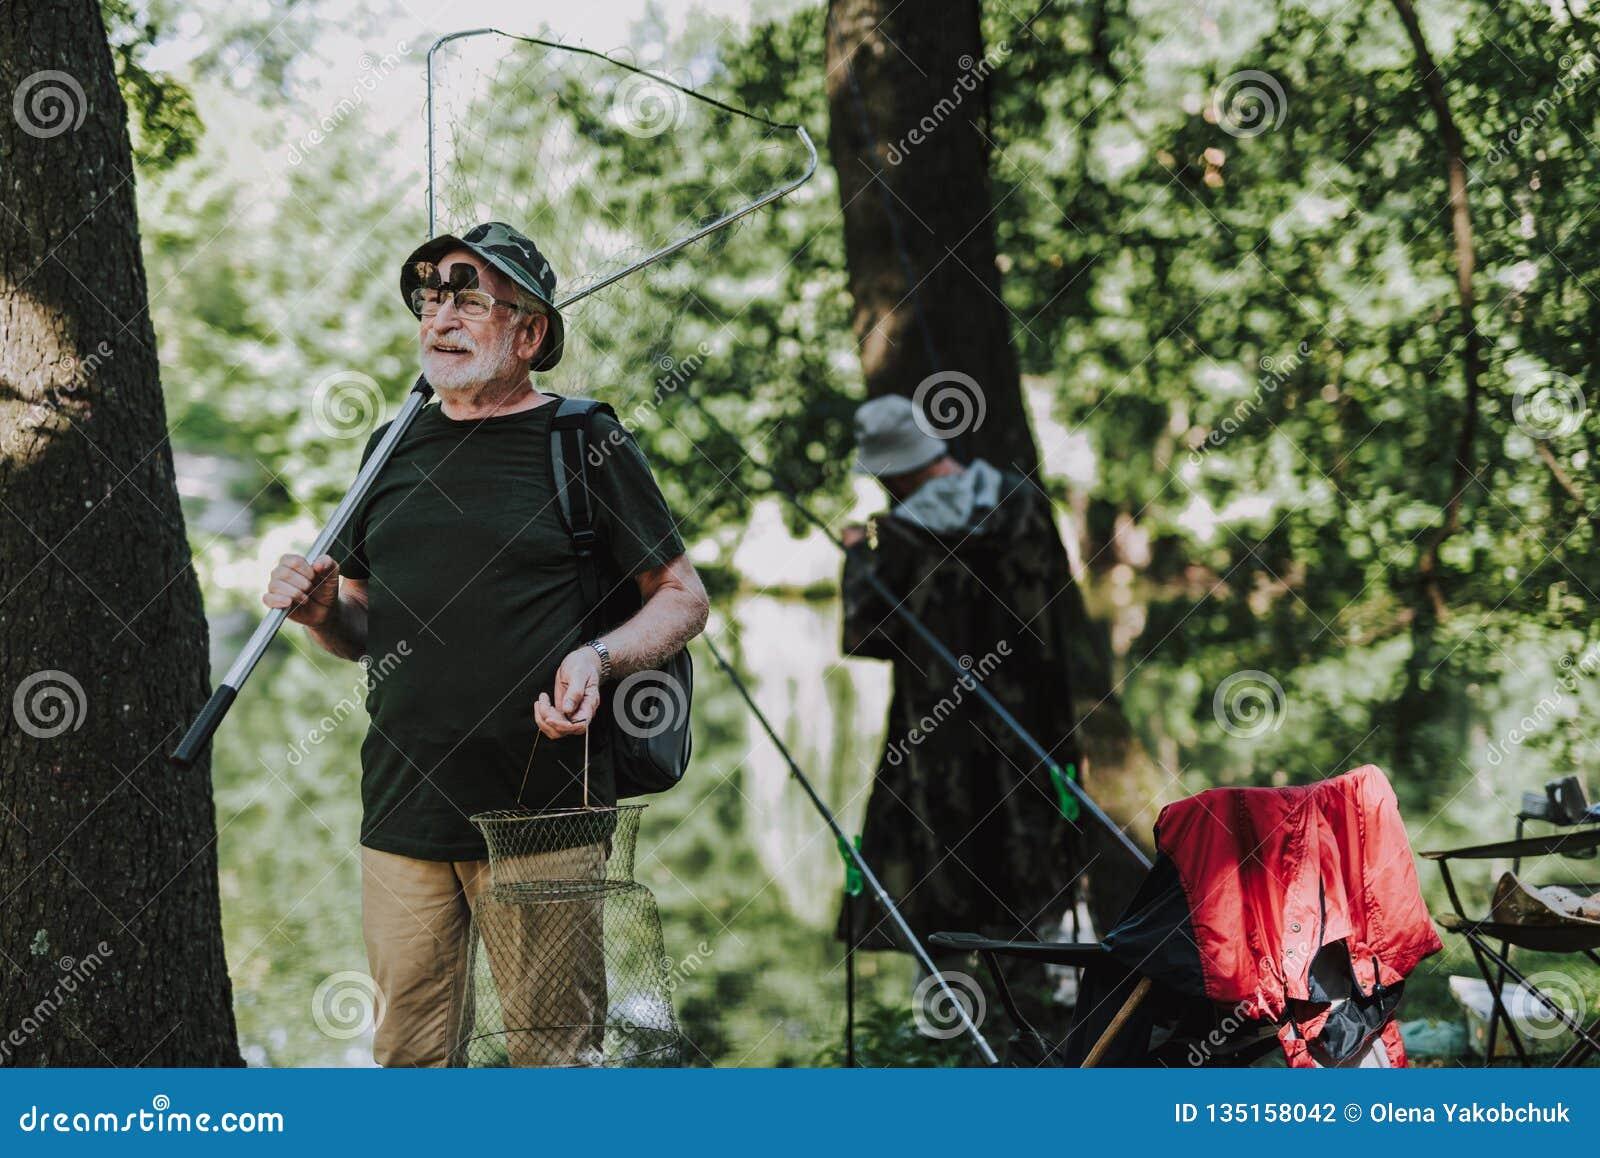 Fisher masculino positivo que guarda o equipamento de pesca profissional